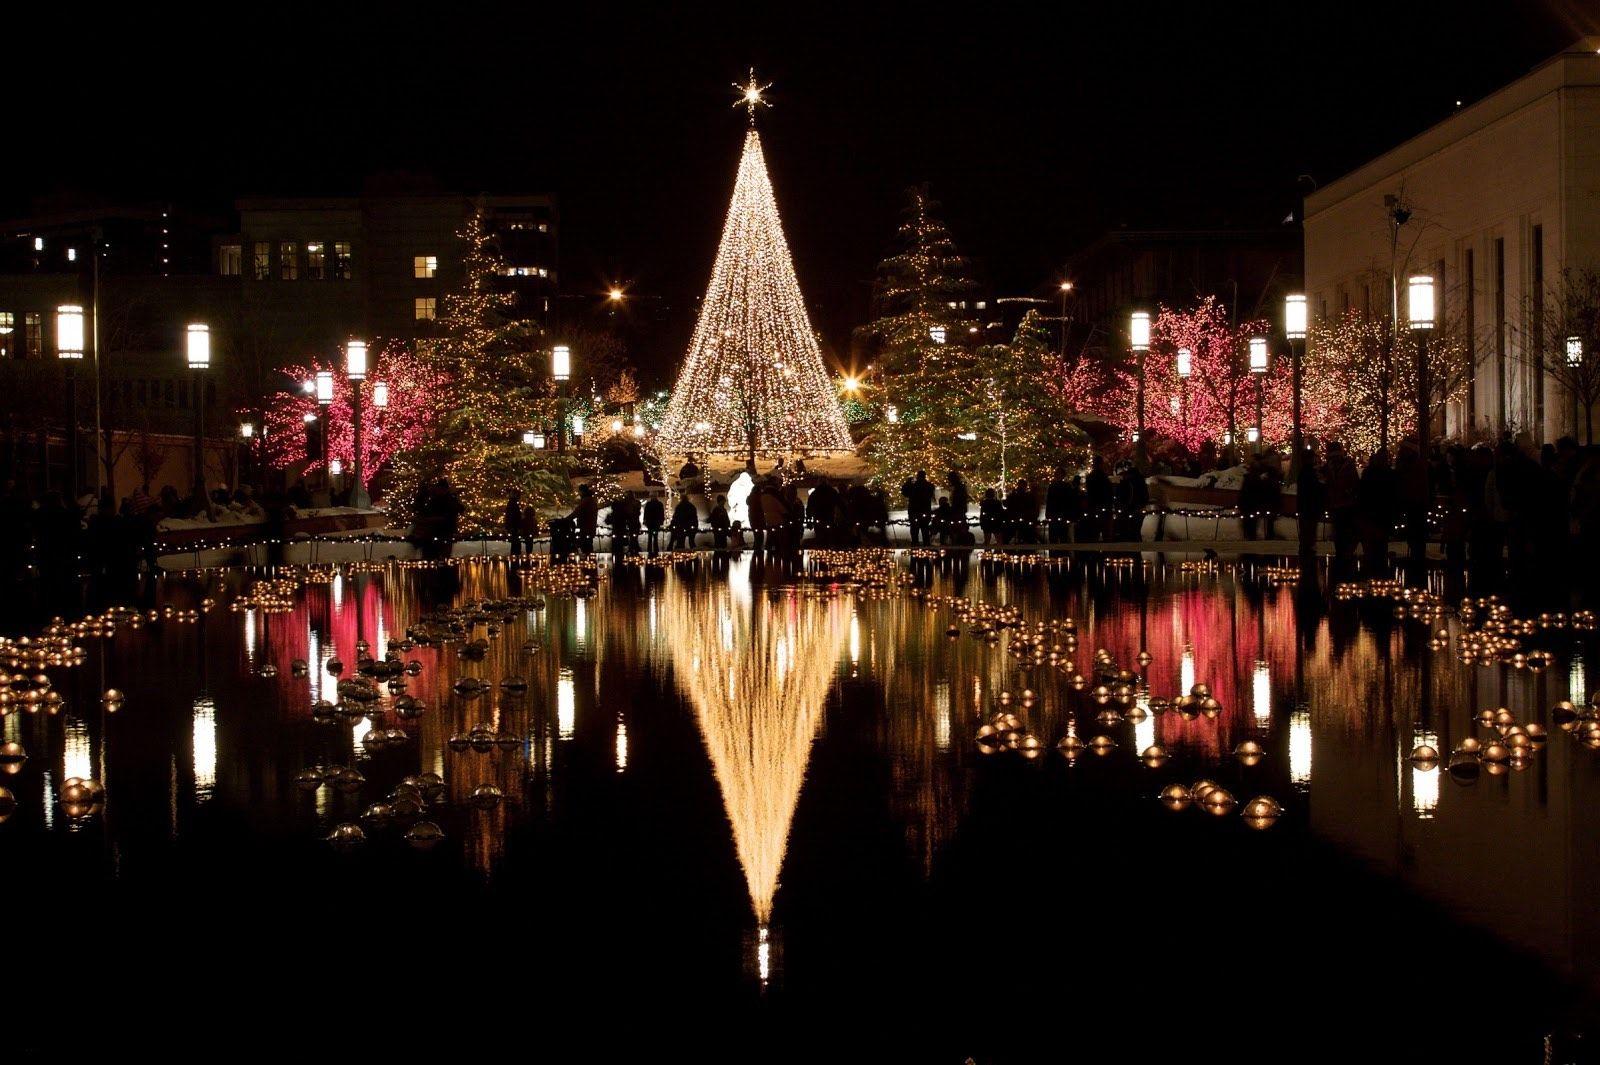 Temple Square Salt Lake City Christmas Lights.01 Temple Square Salt Lake City Travel Best Christmas